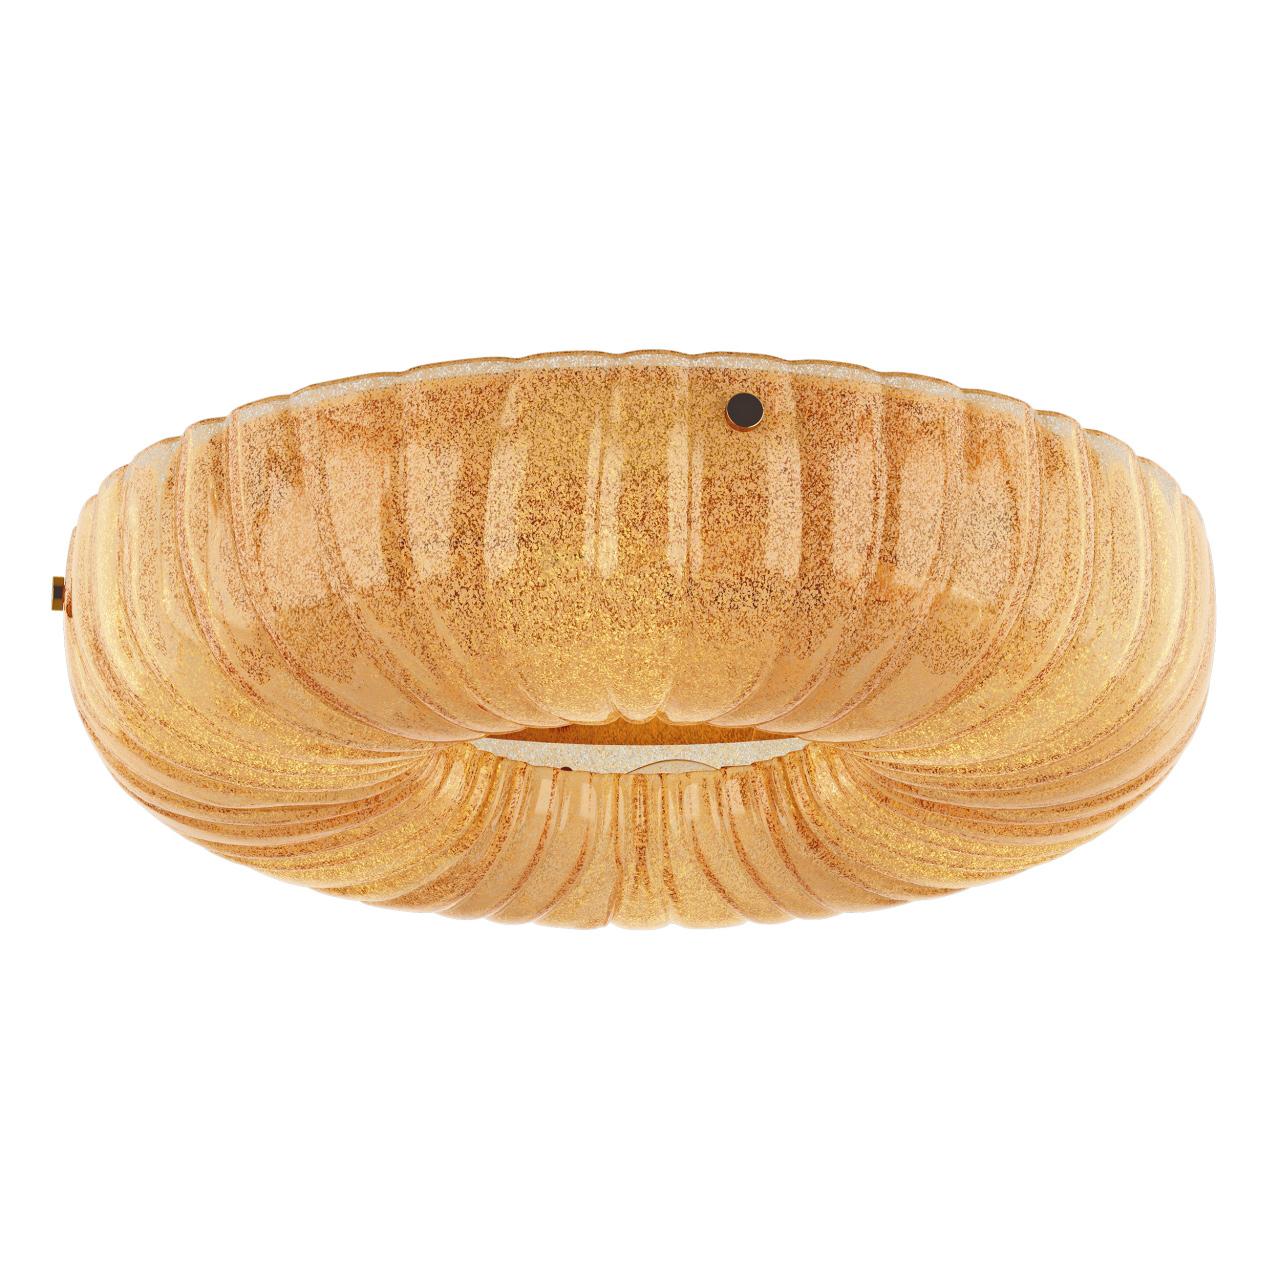 Плафон потолочный Zucche 6х60W E14 золото / янтарь Lightstar 820363